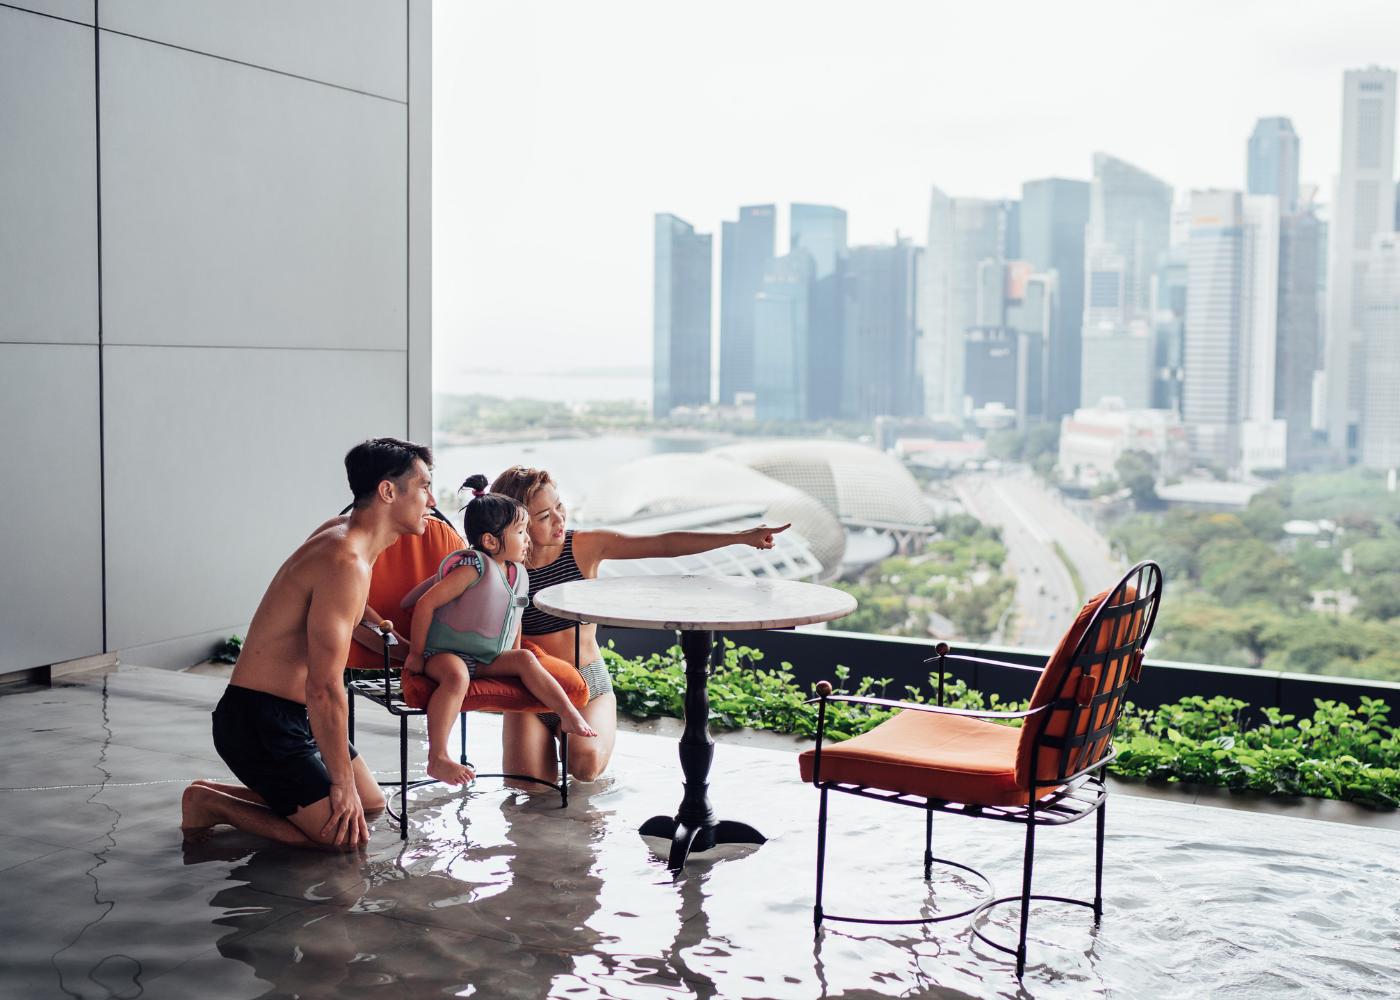 JW Marriott South Beach: a family-friendly staycay